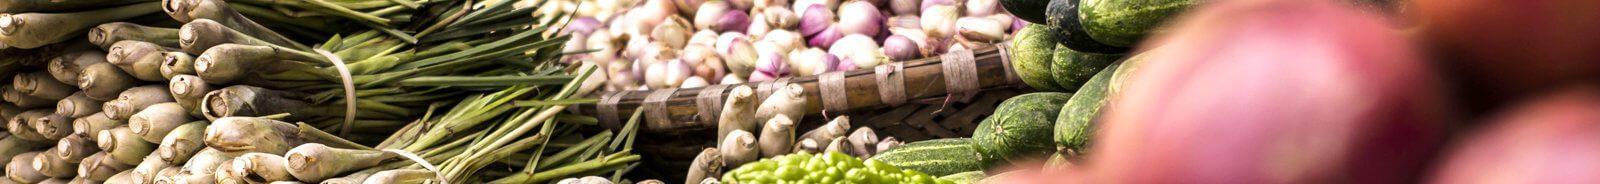 Farmers' market shallots, zucchini, and green onions.